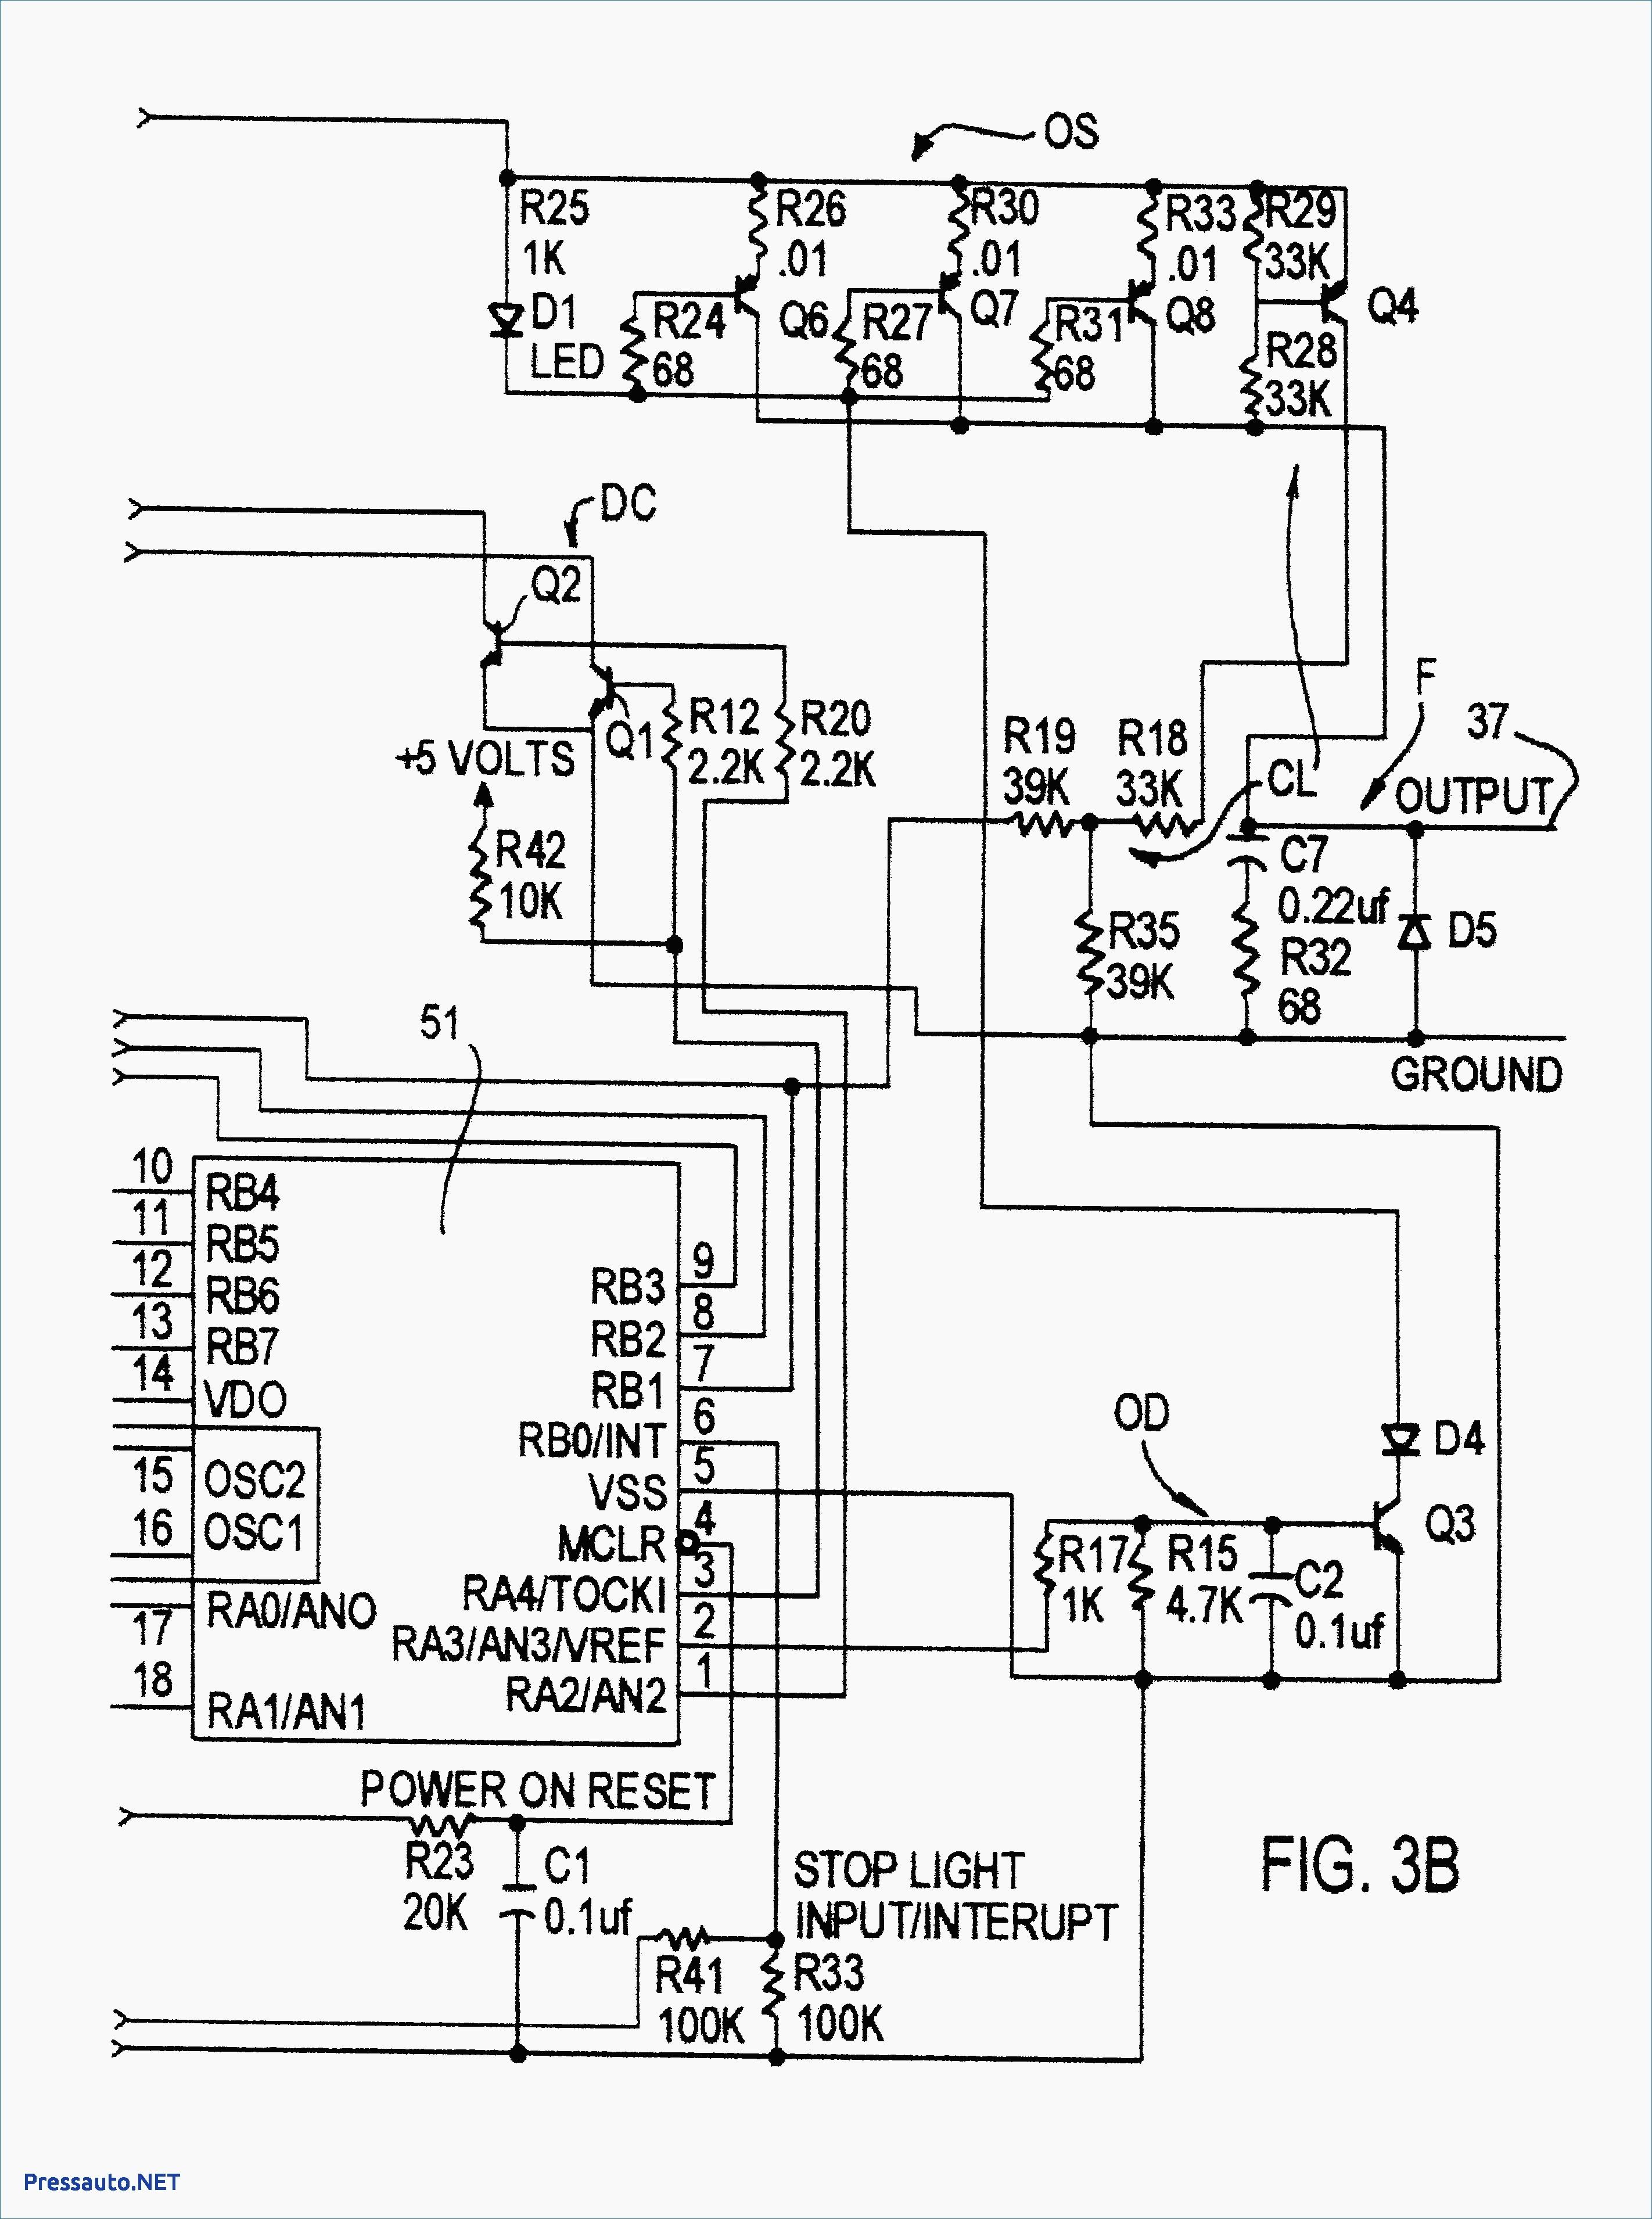 Nice Trailer Breakaway Battery Wiring Gift - The Wire - magnox.info